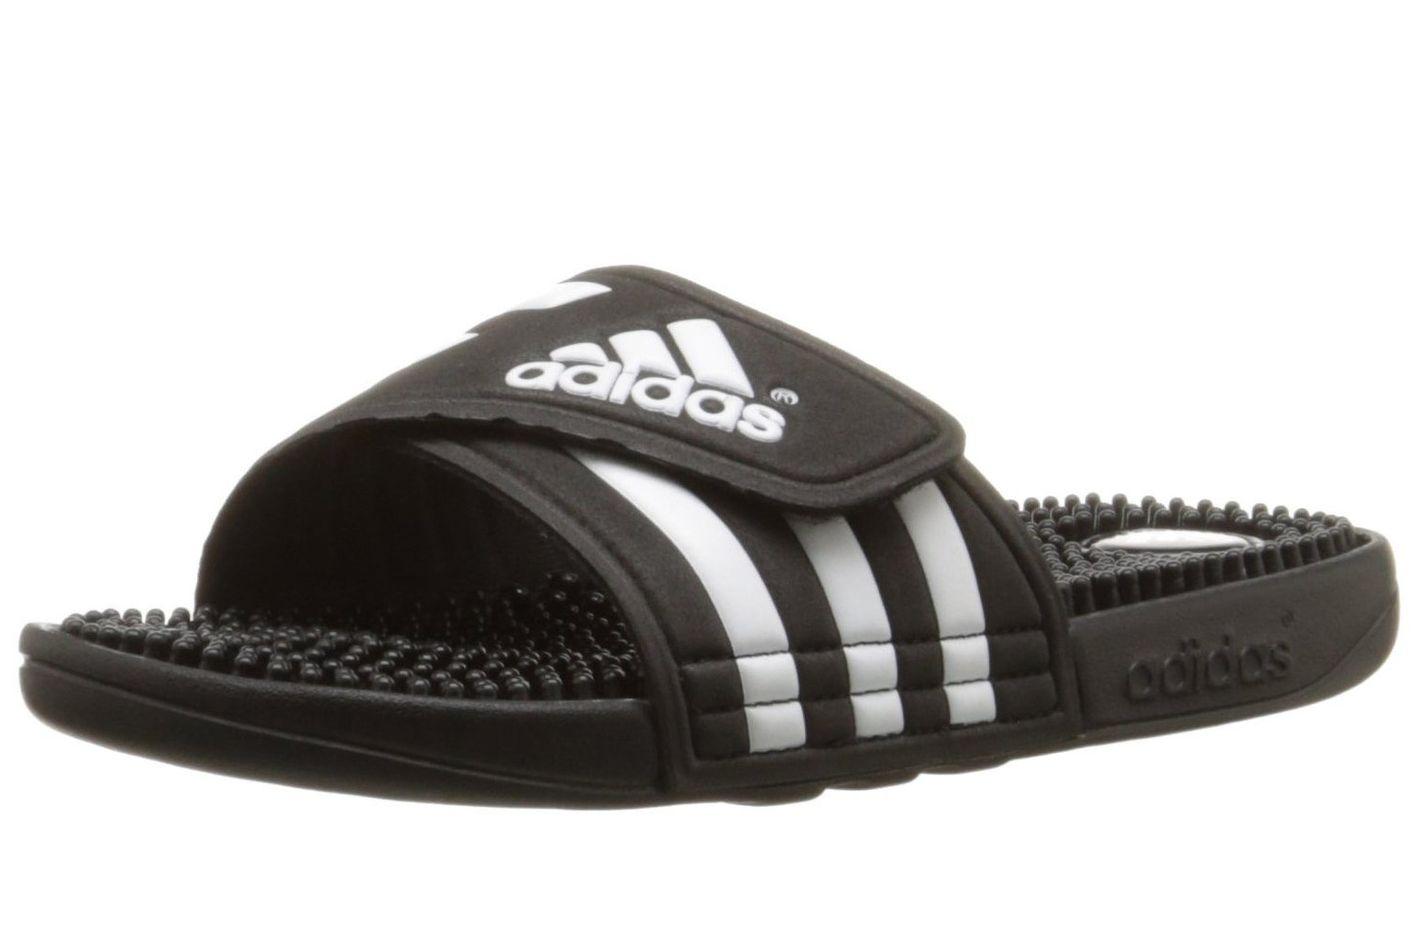 Adidas Adissage Slides